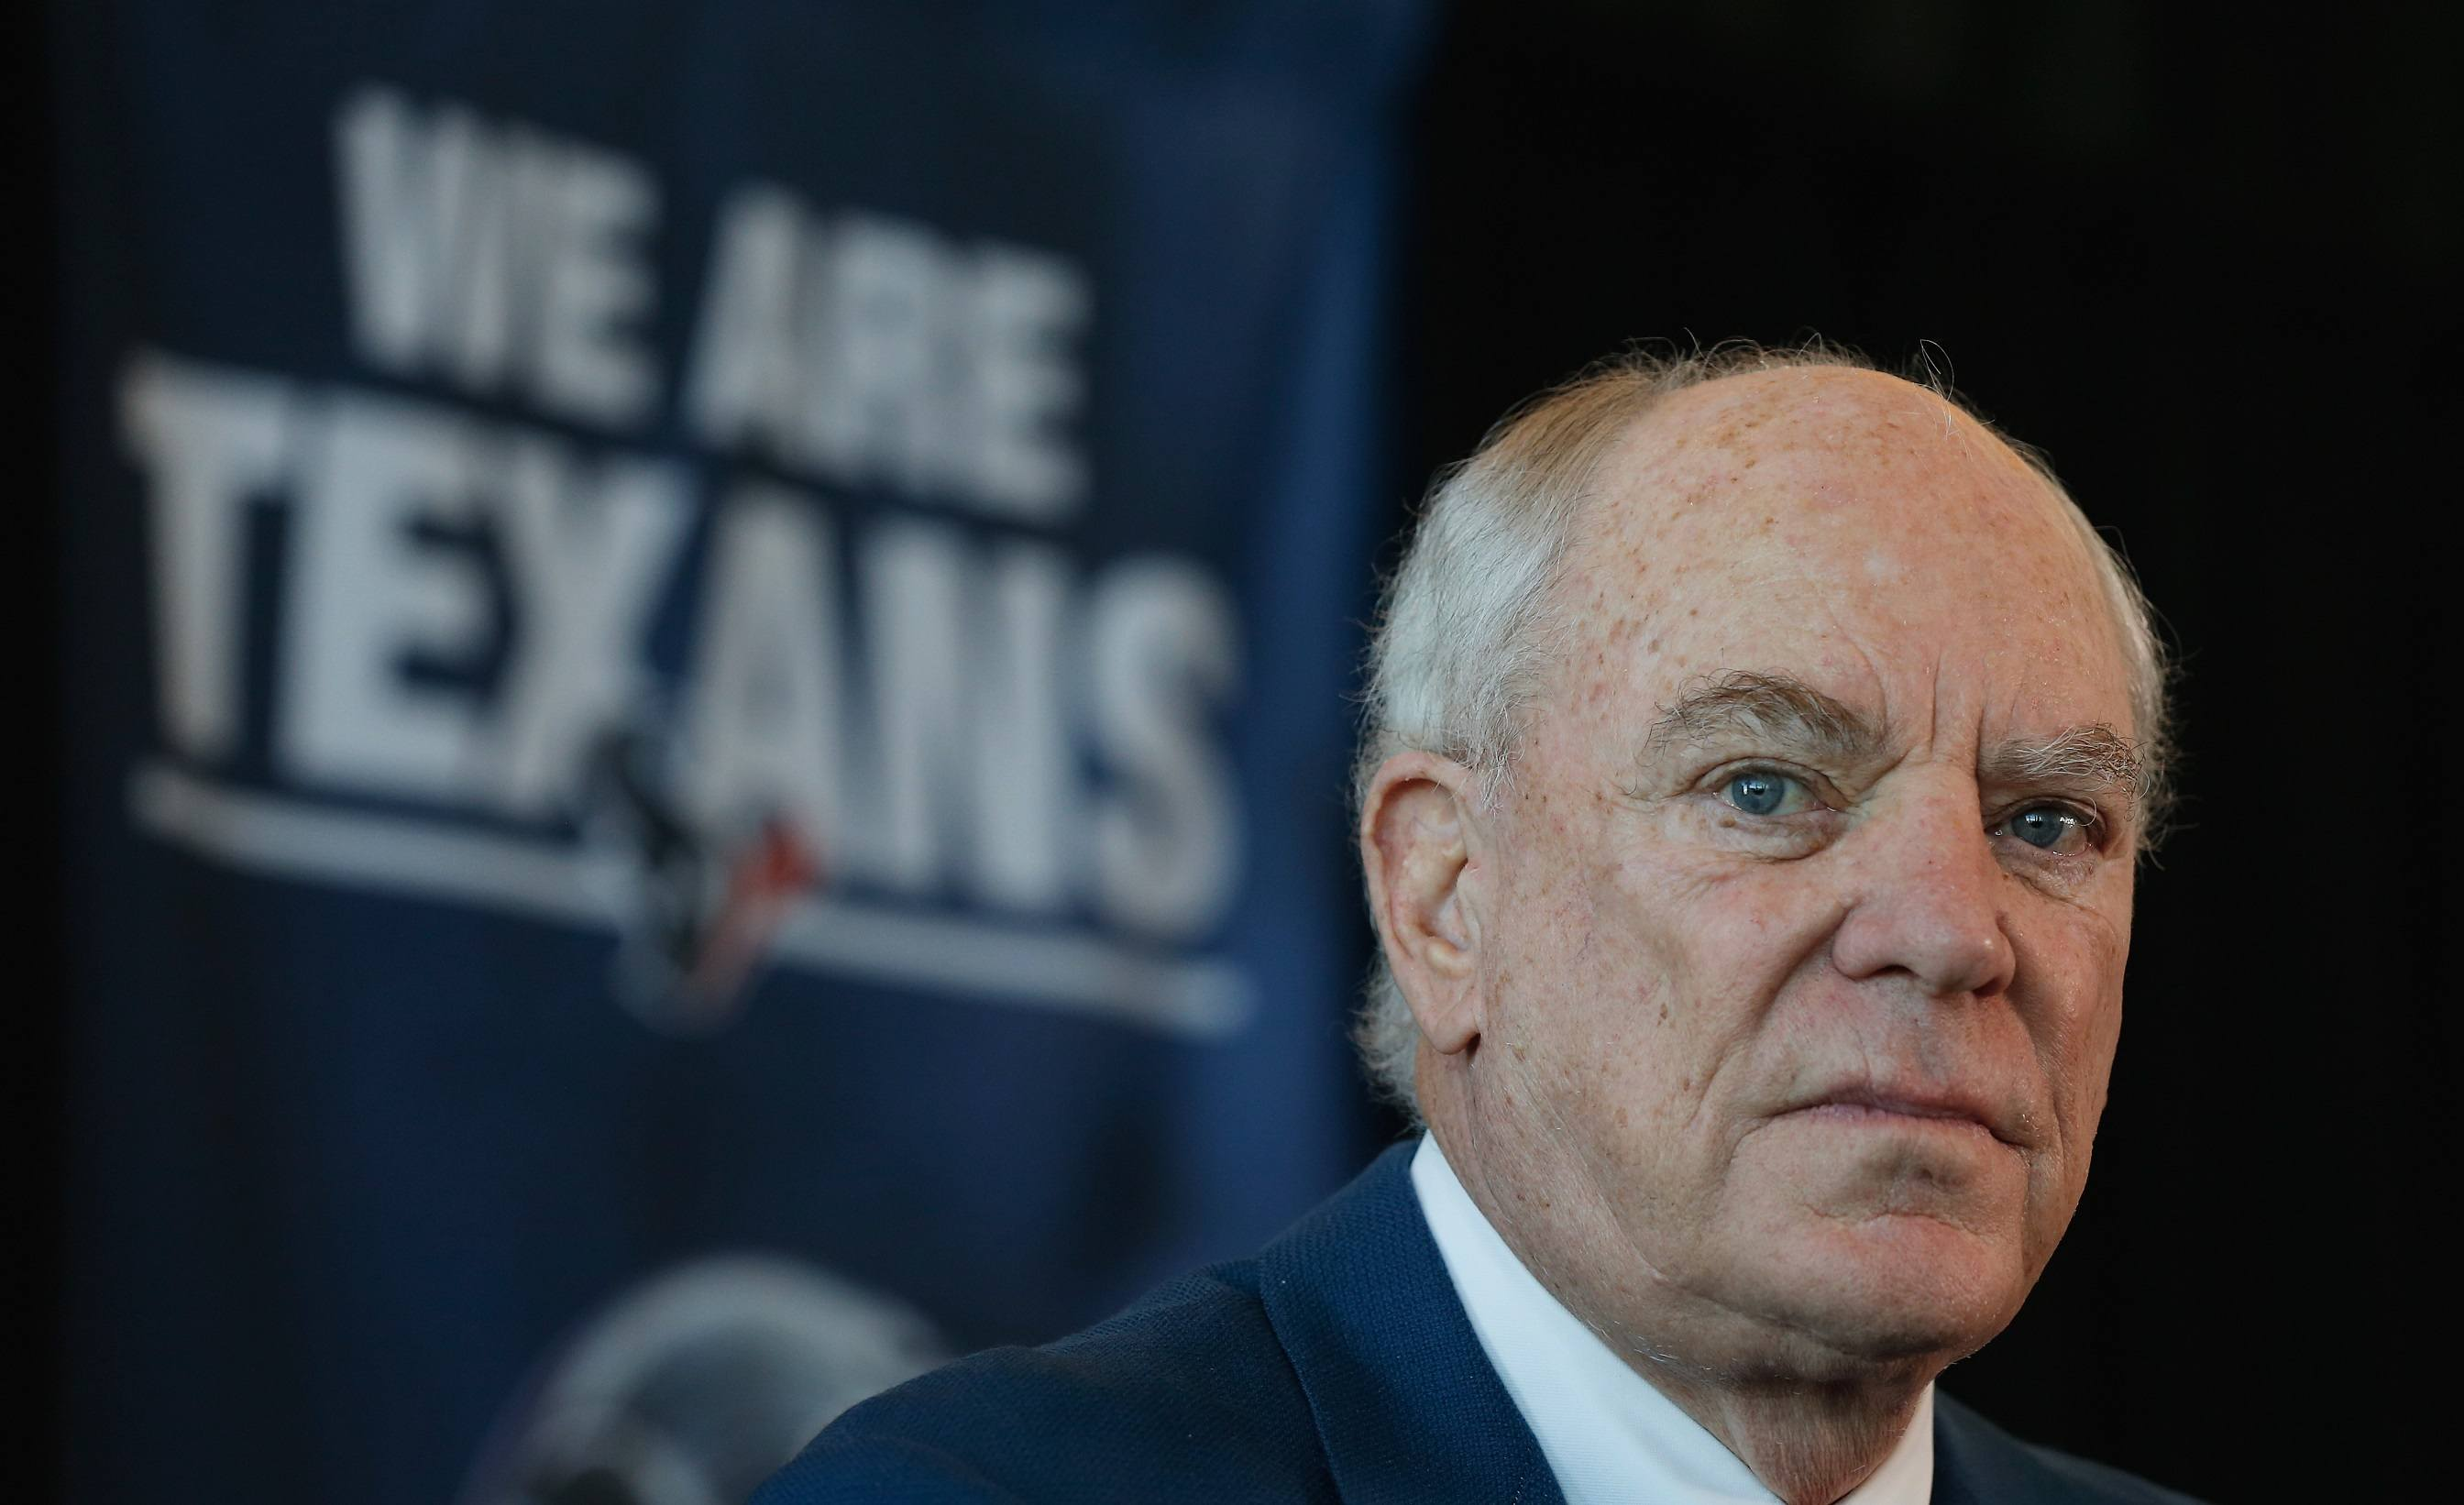 Houston Texans owner Bob McNair